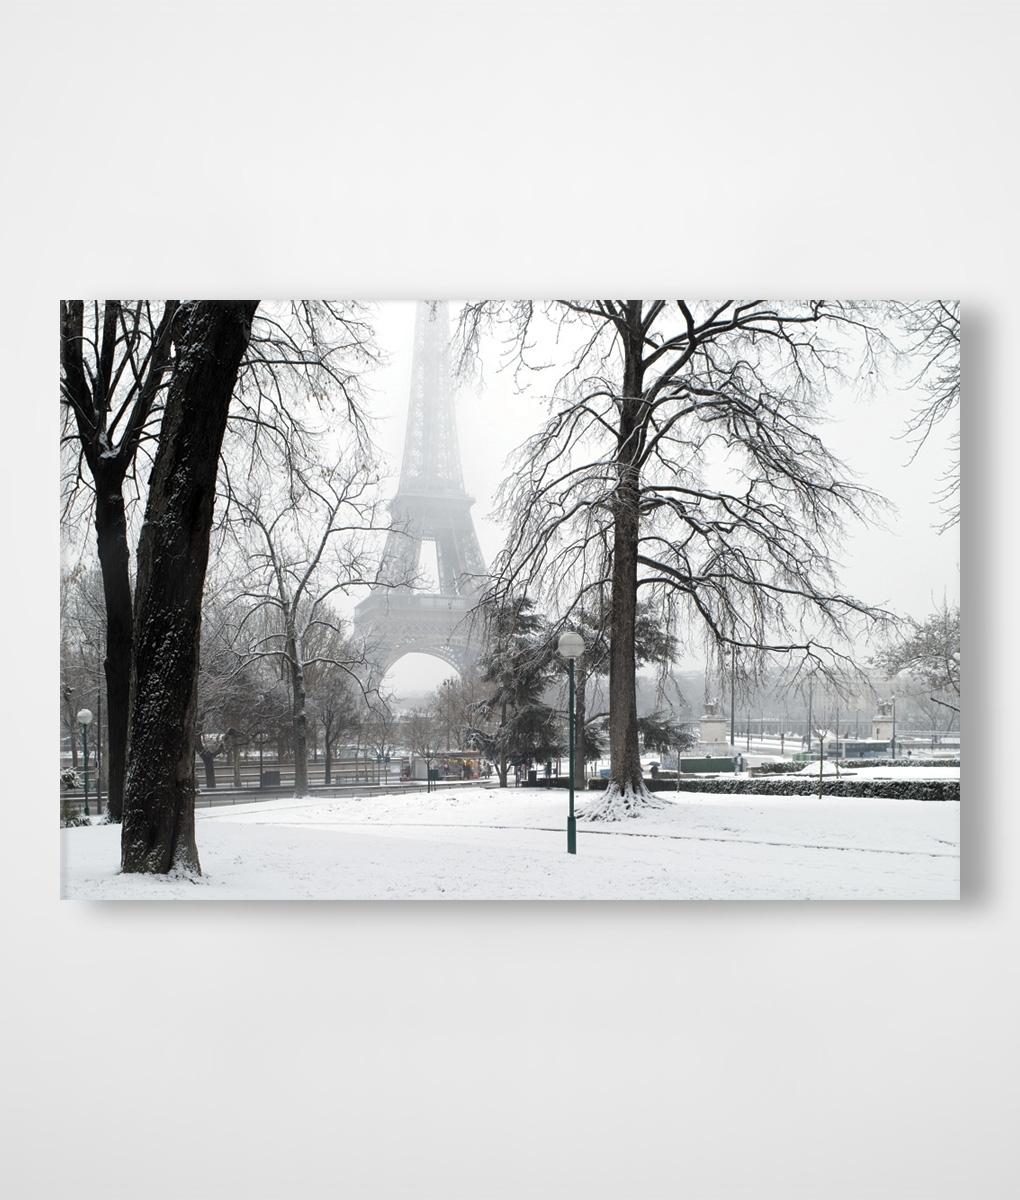 Paris In Winter Snow Canvas Print | Framingland Regarding Most Current Eiffel Tower Canvas Wall Art (Gallery 11 of 15)